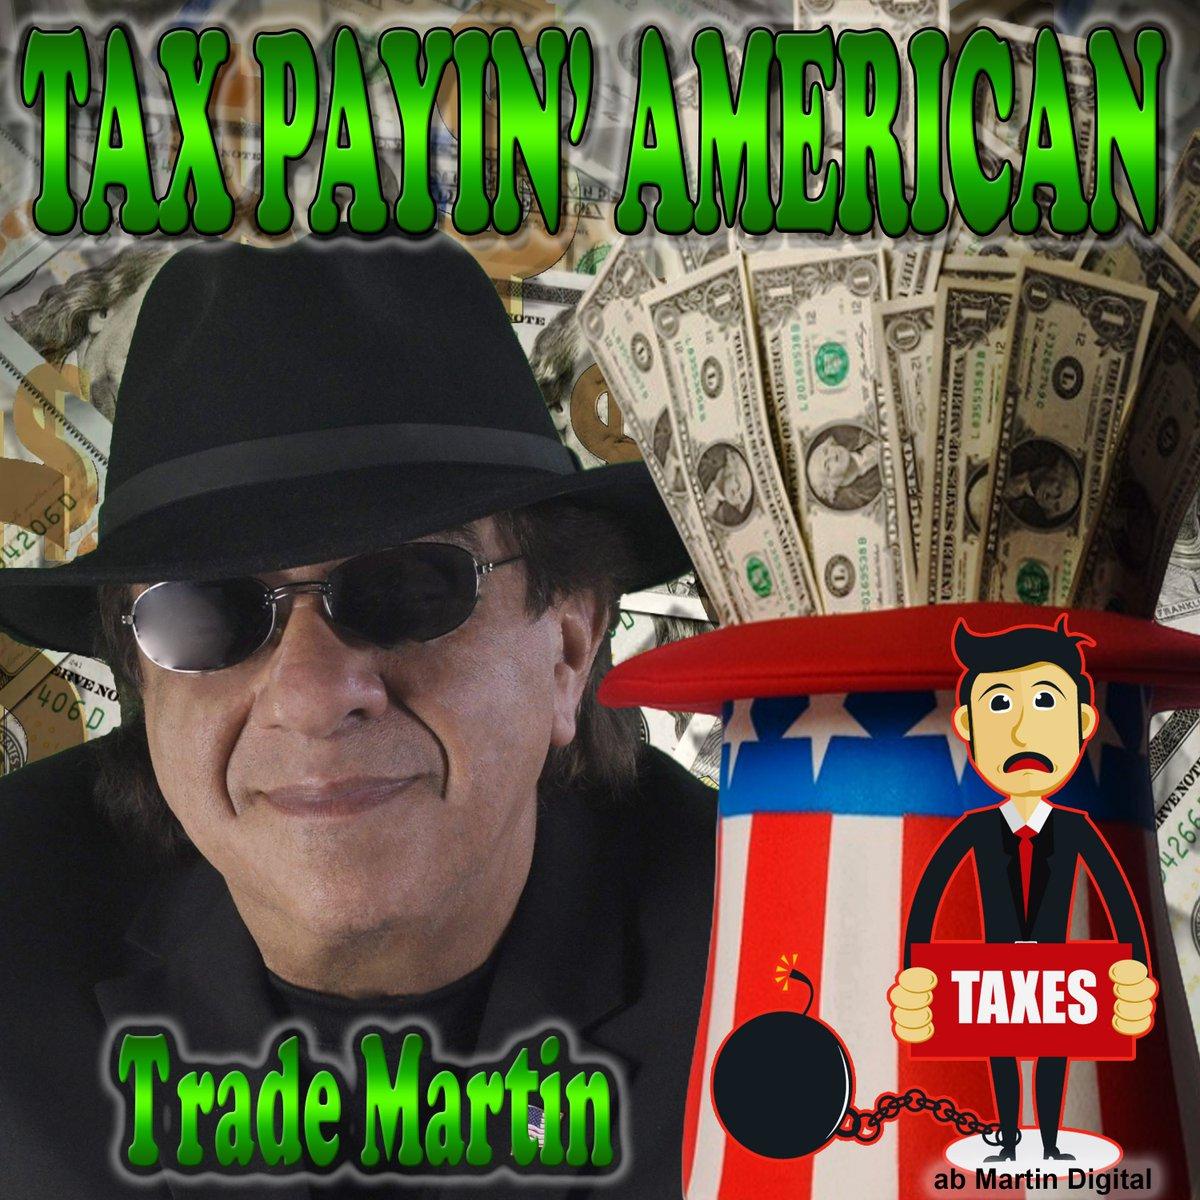 .Tax Payin American https://www.youtube.com/watch?v=ptV11ml9Pgk… #TradeMartin #abMartinDigital #Spotify #Amazon #iTunes #AppleMusic #Pandora RETWEET